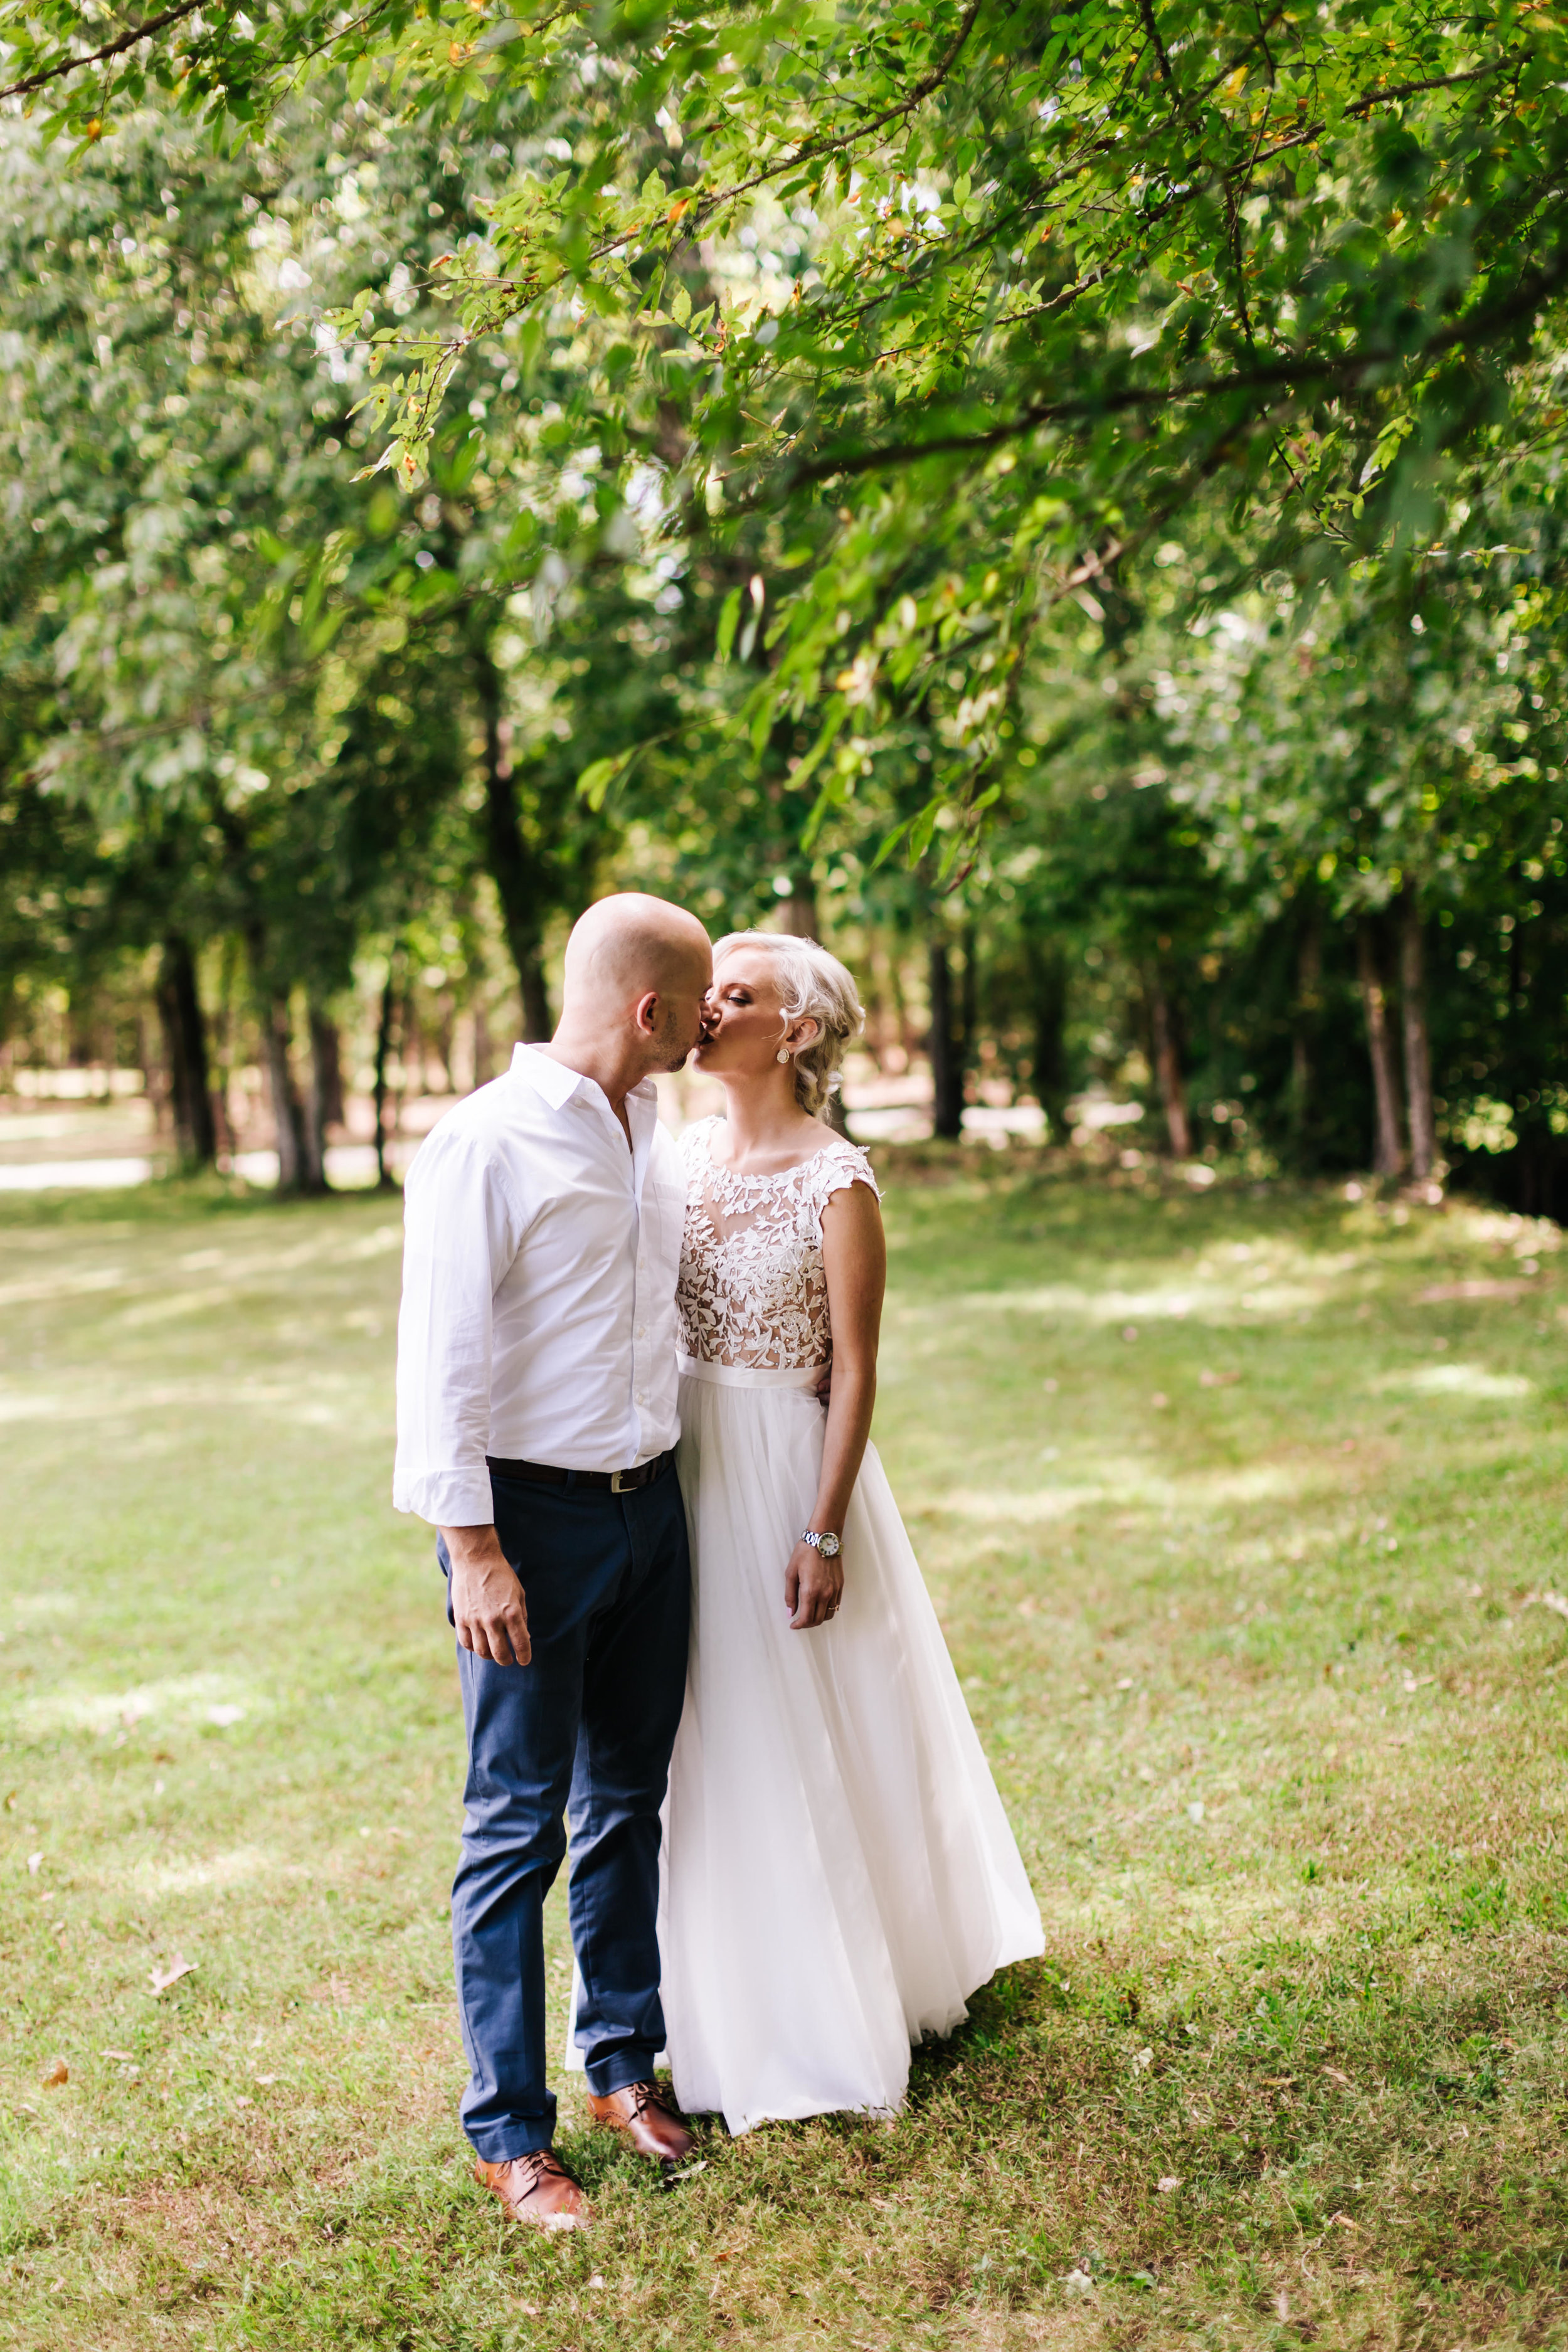 2018.09.02 Ray and Sarah Prizner Nashville TN Wedding FINALS-94.jpg